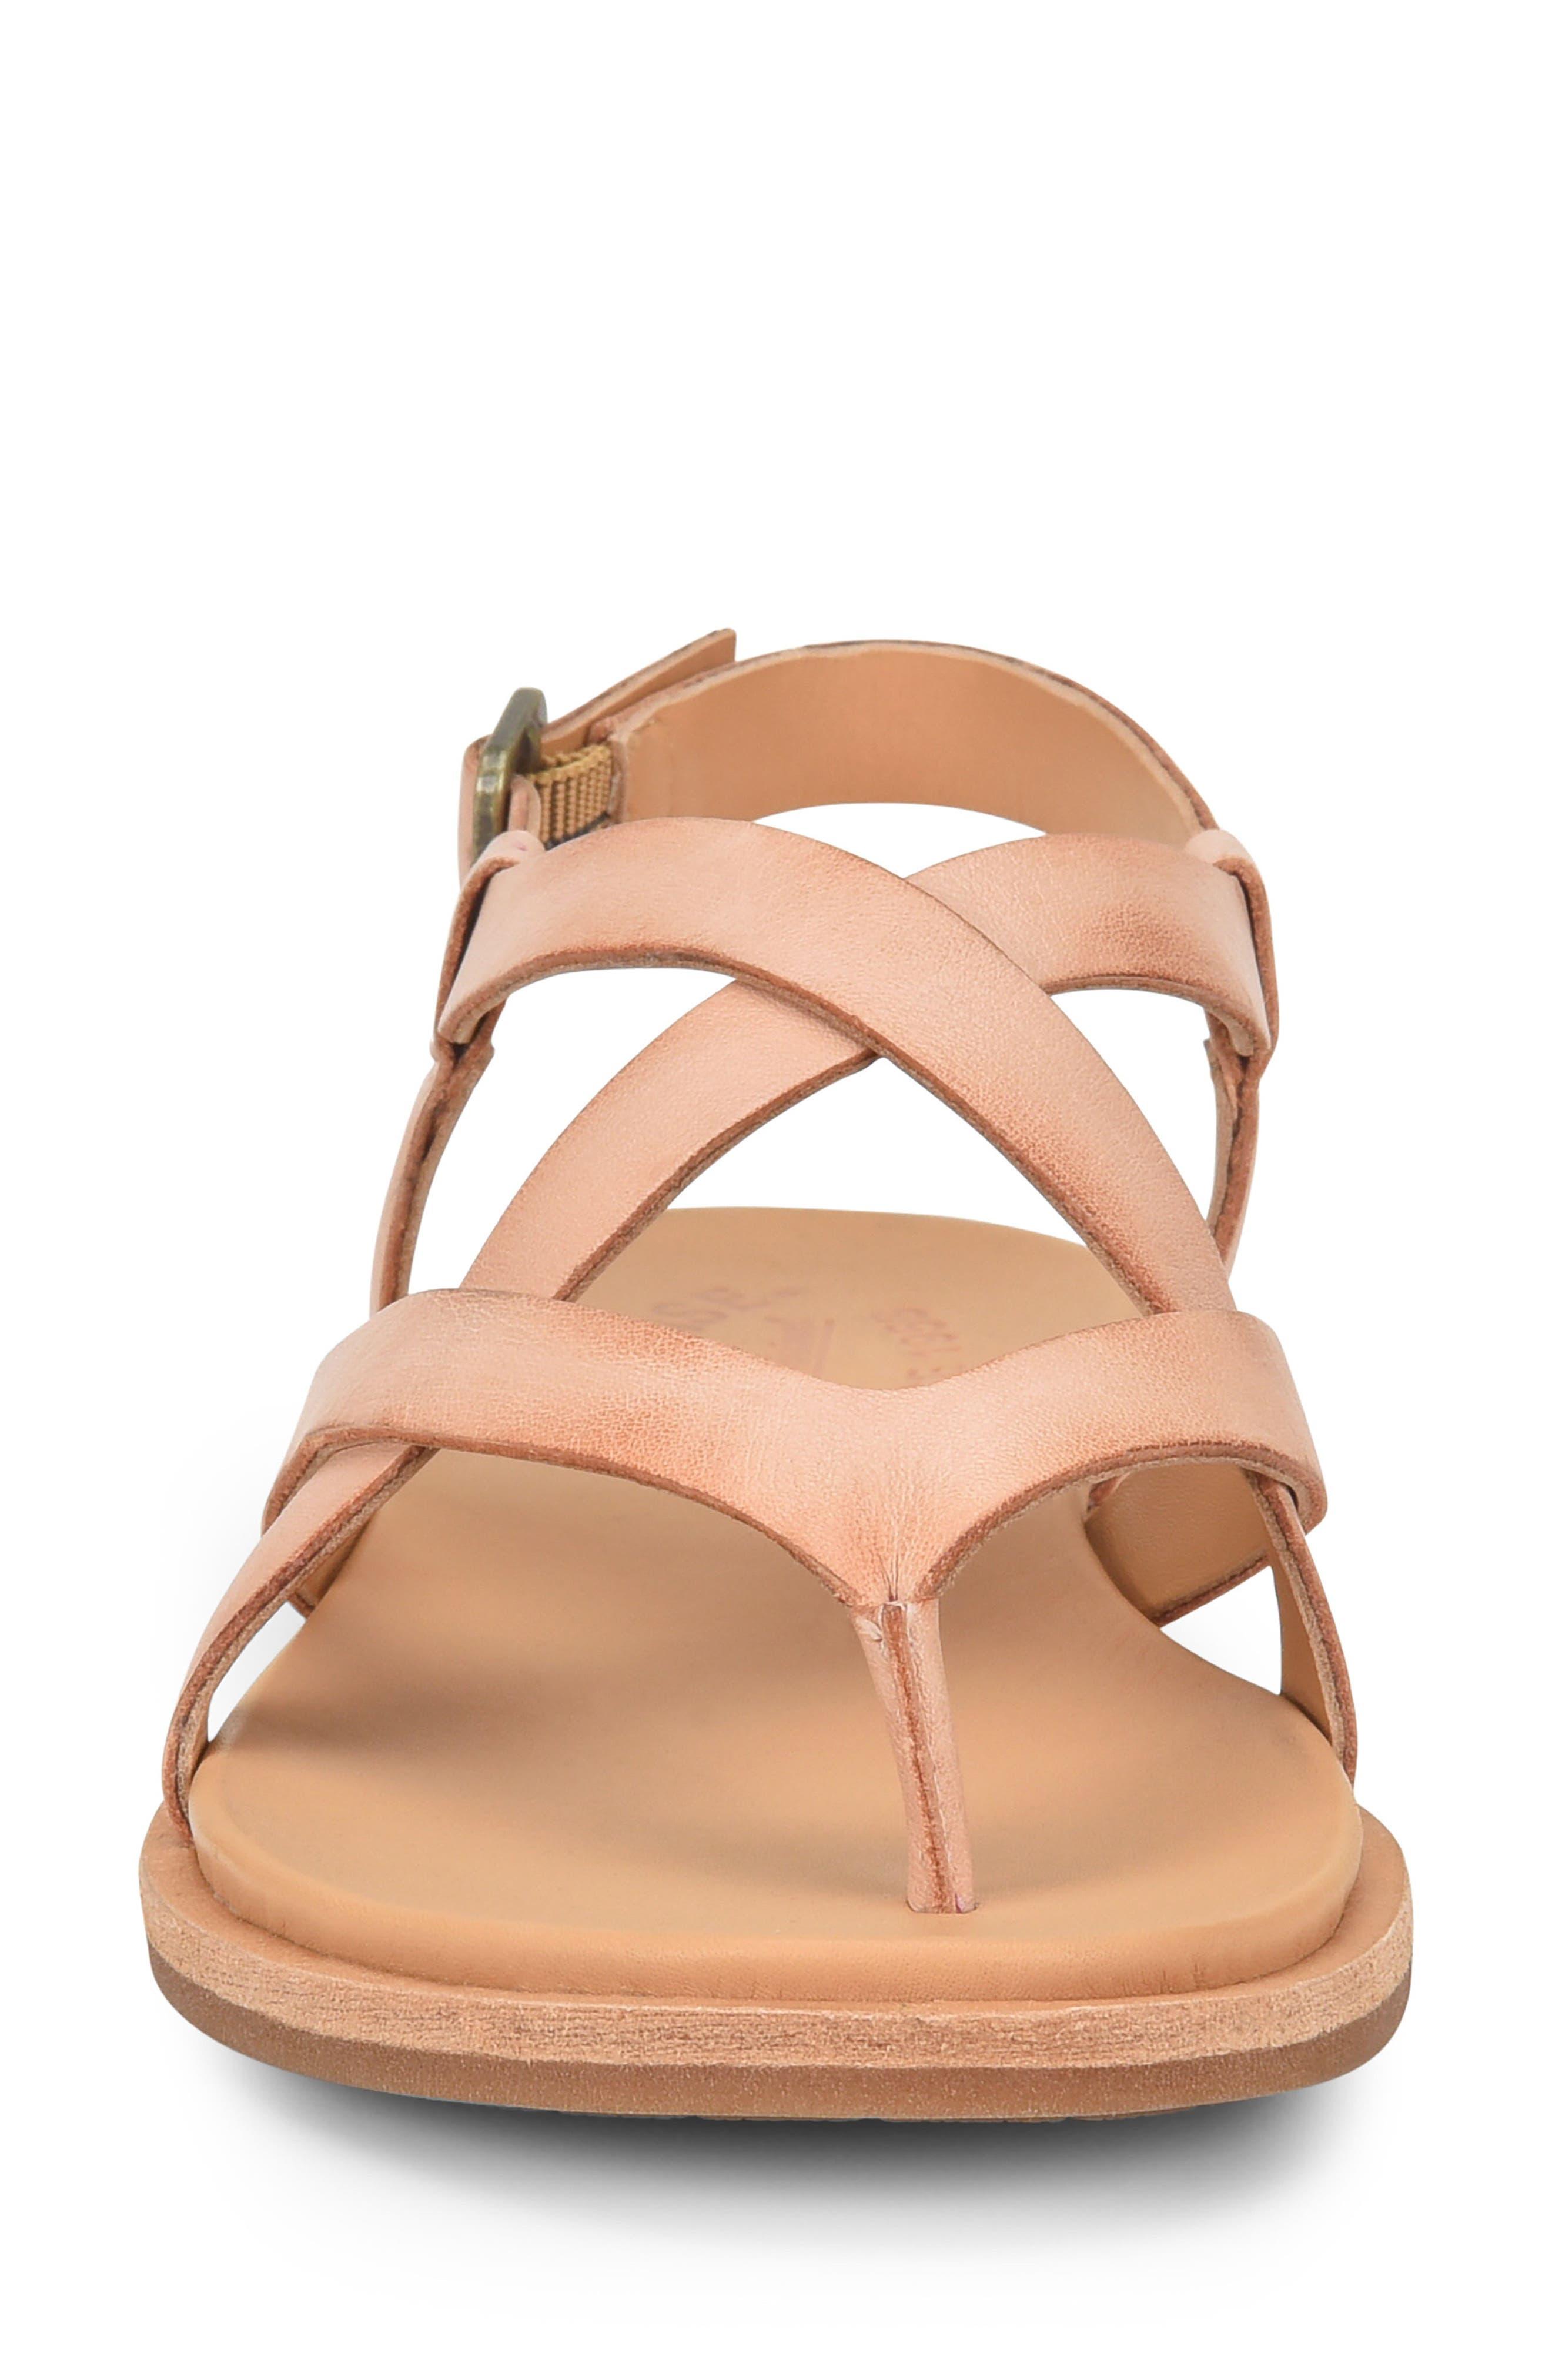 Yarbrough Sandal,                             Alternate thumbnail 4, color,                             Blush Leather